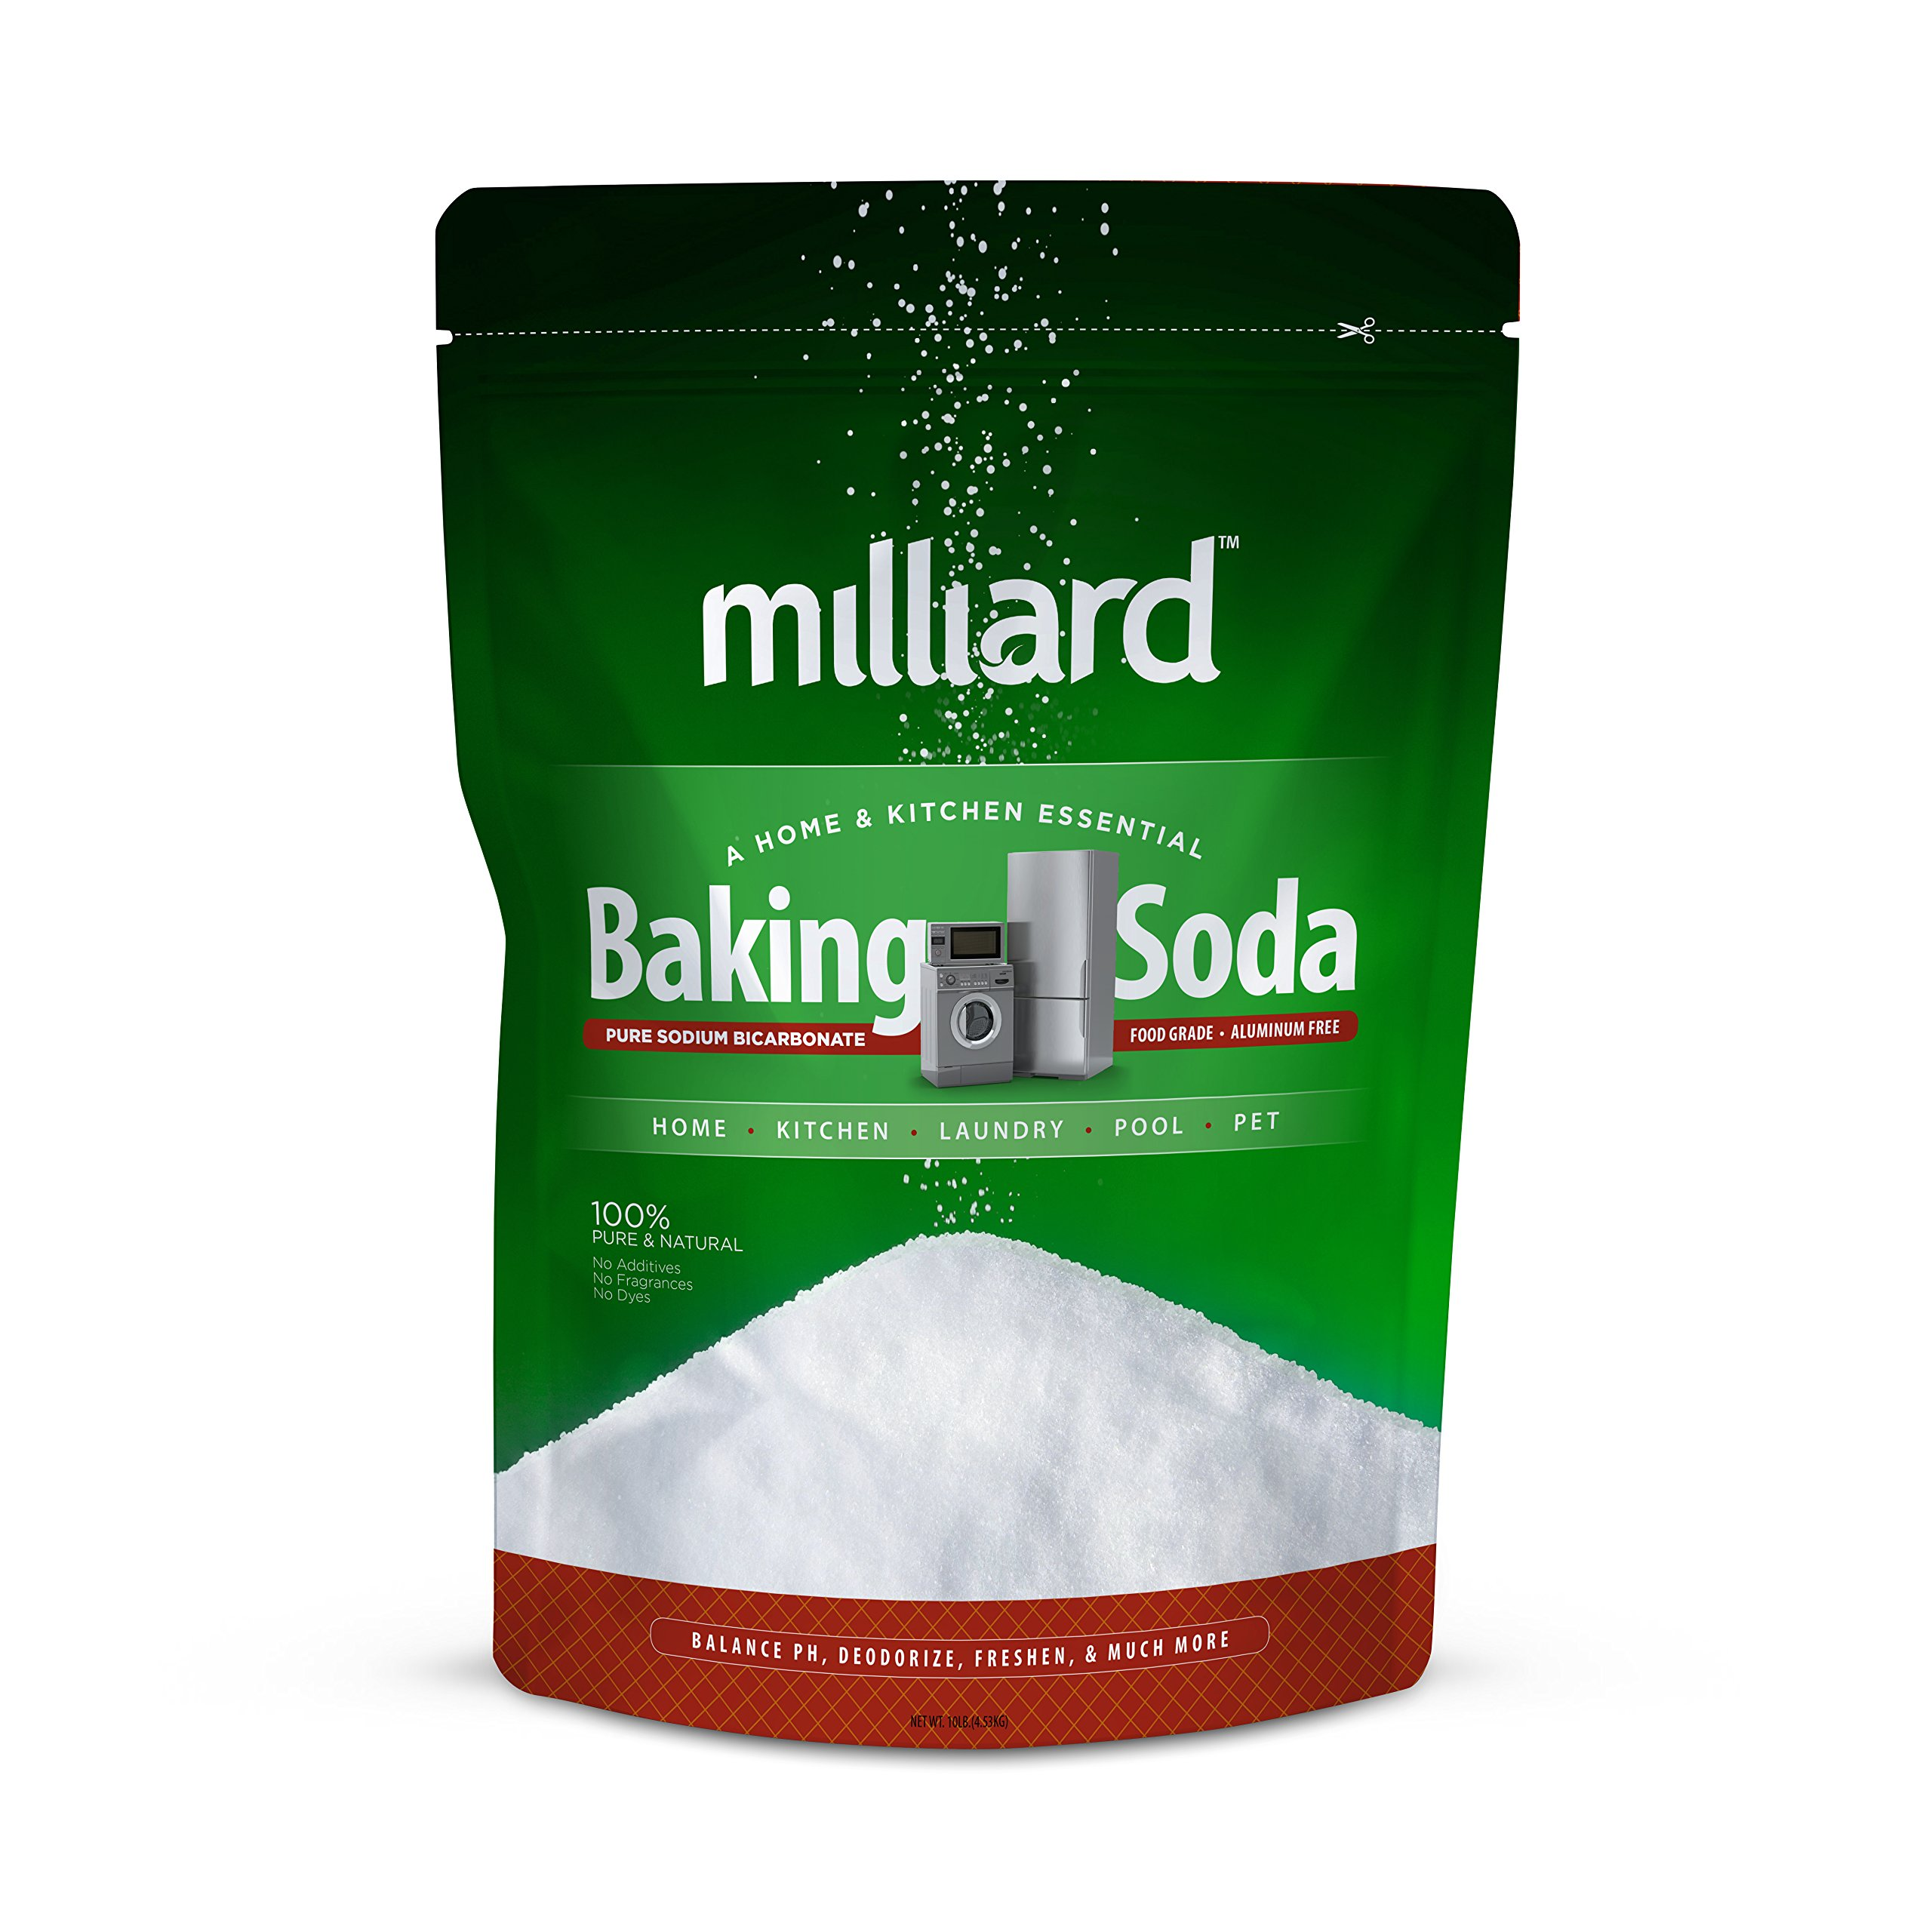 Milliard 10lbs Baking Soda/Sodium Bicarbonate USP - 10 Pound Bulk Resealable Bag